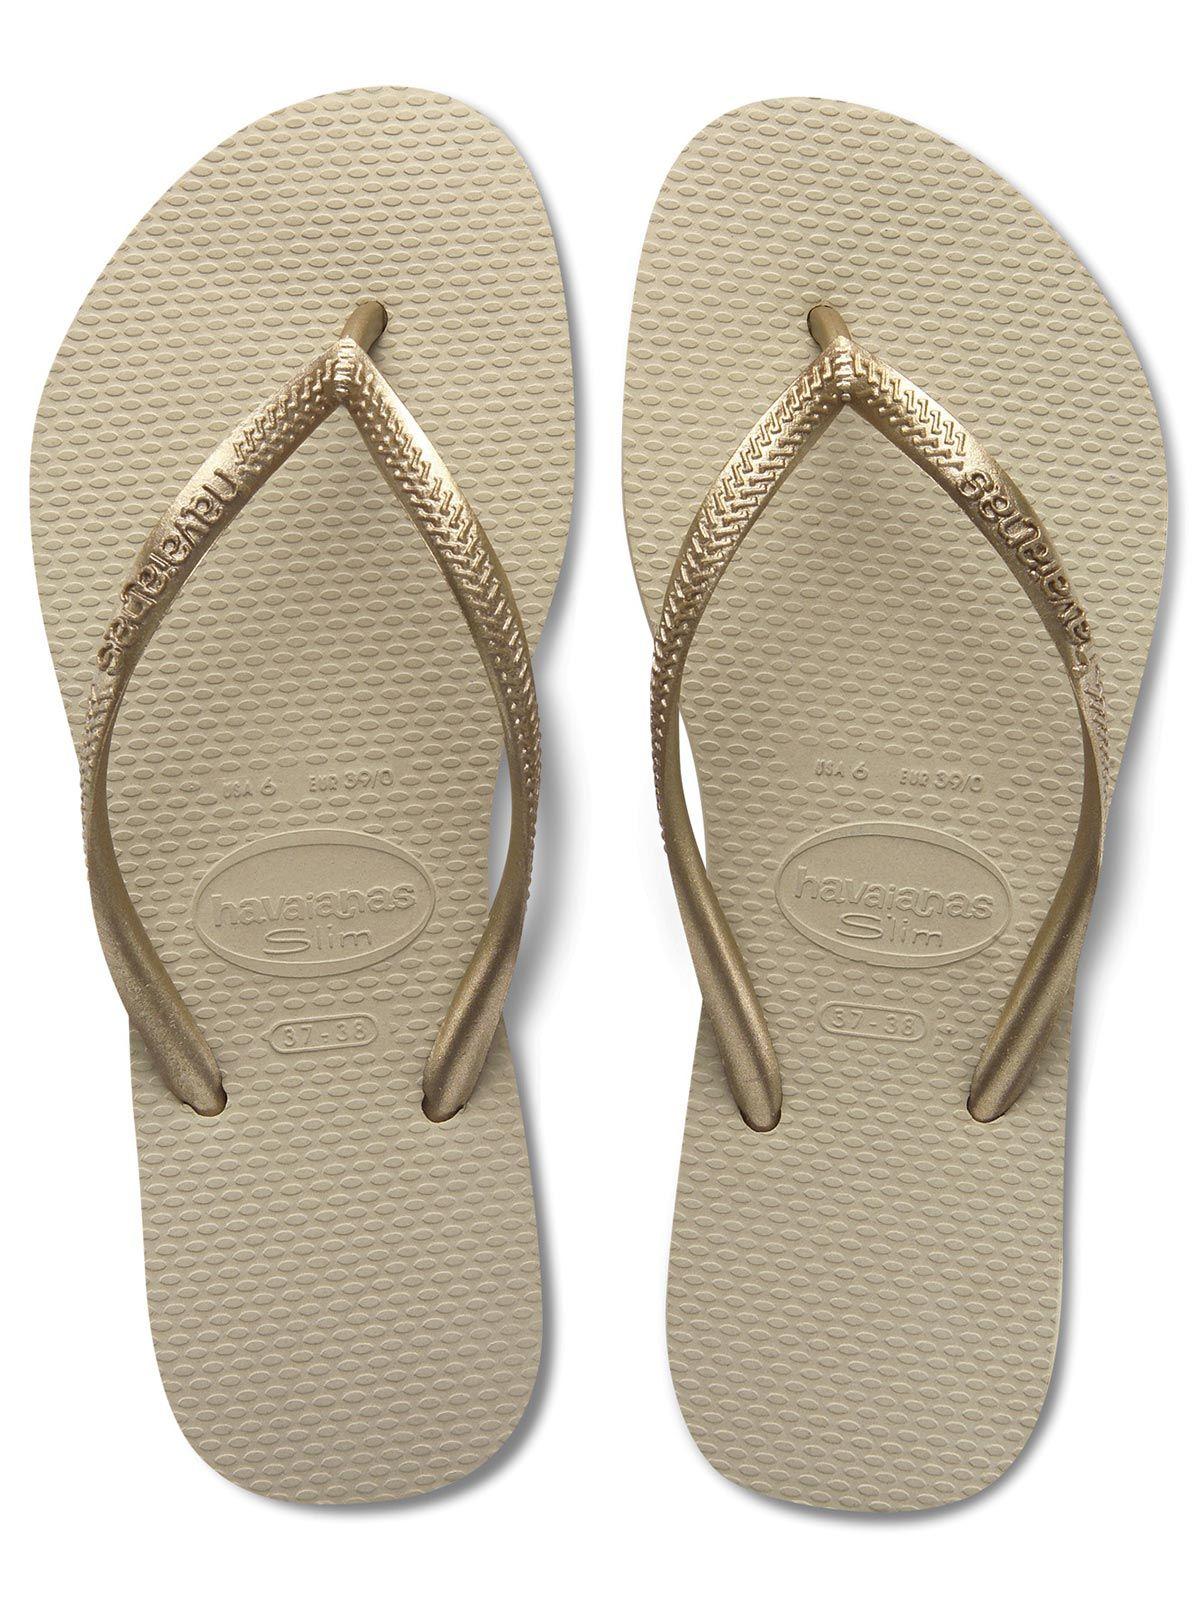 Havaianas Sand Grey | Havaianas Sand/Golden | Pinterest | Australia and  Sandals